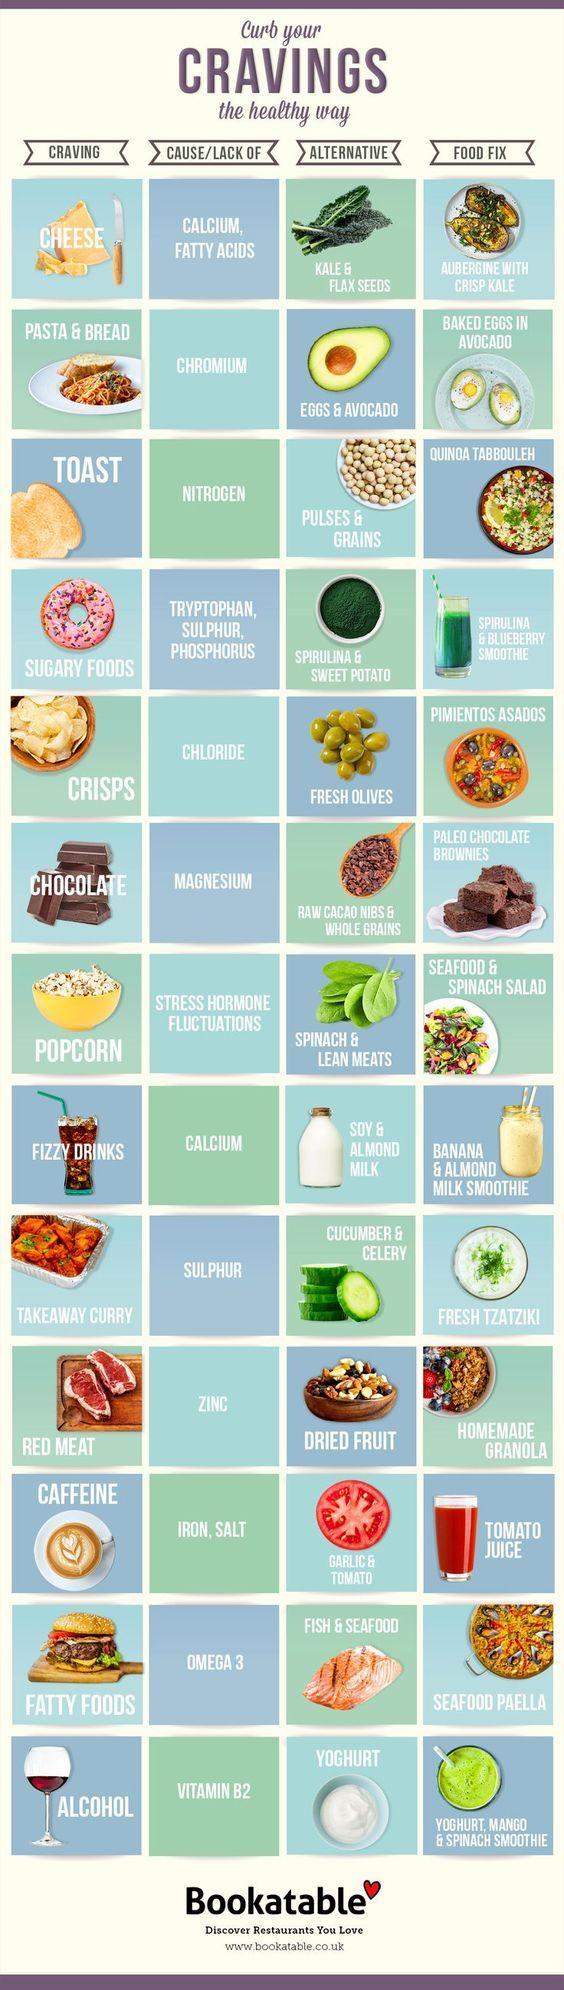 Hcg weight loss chart pdf